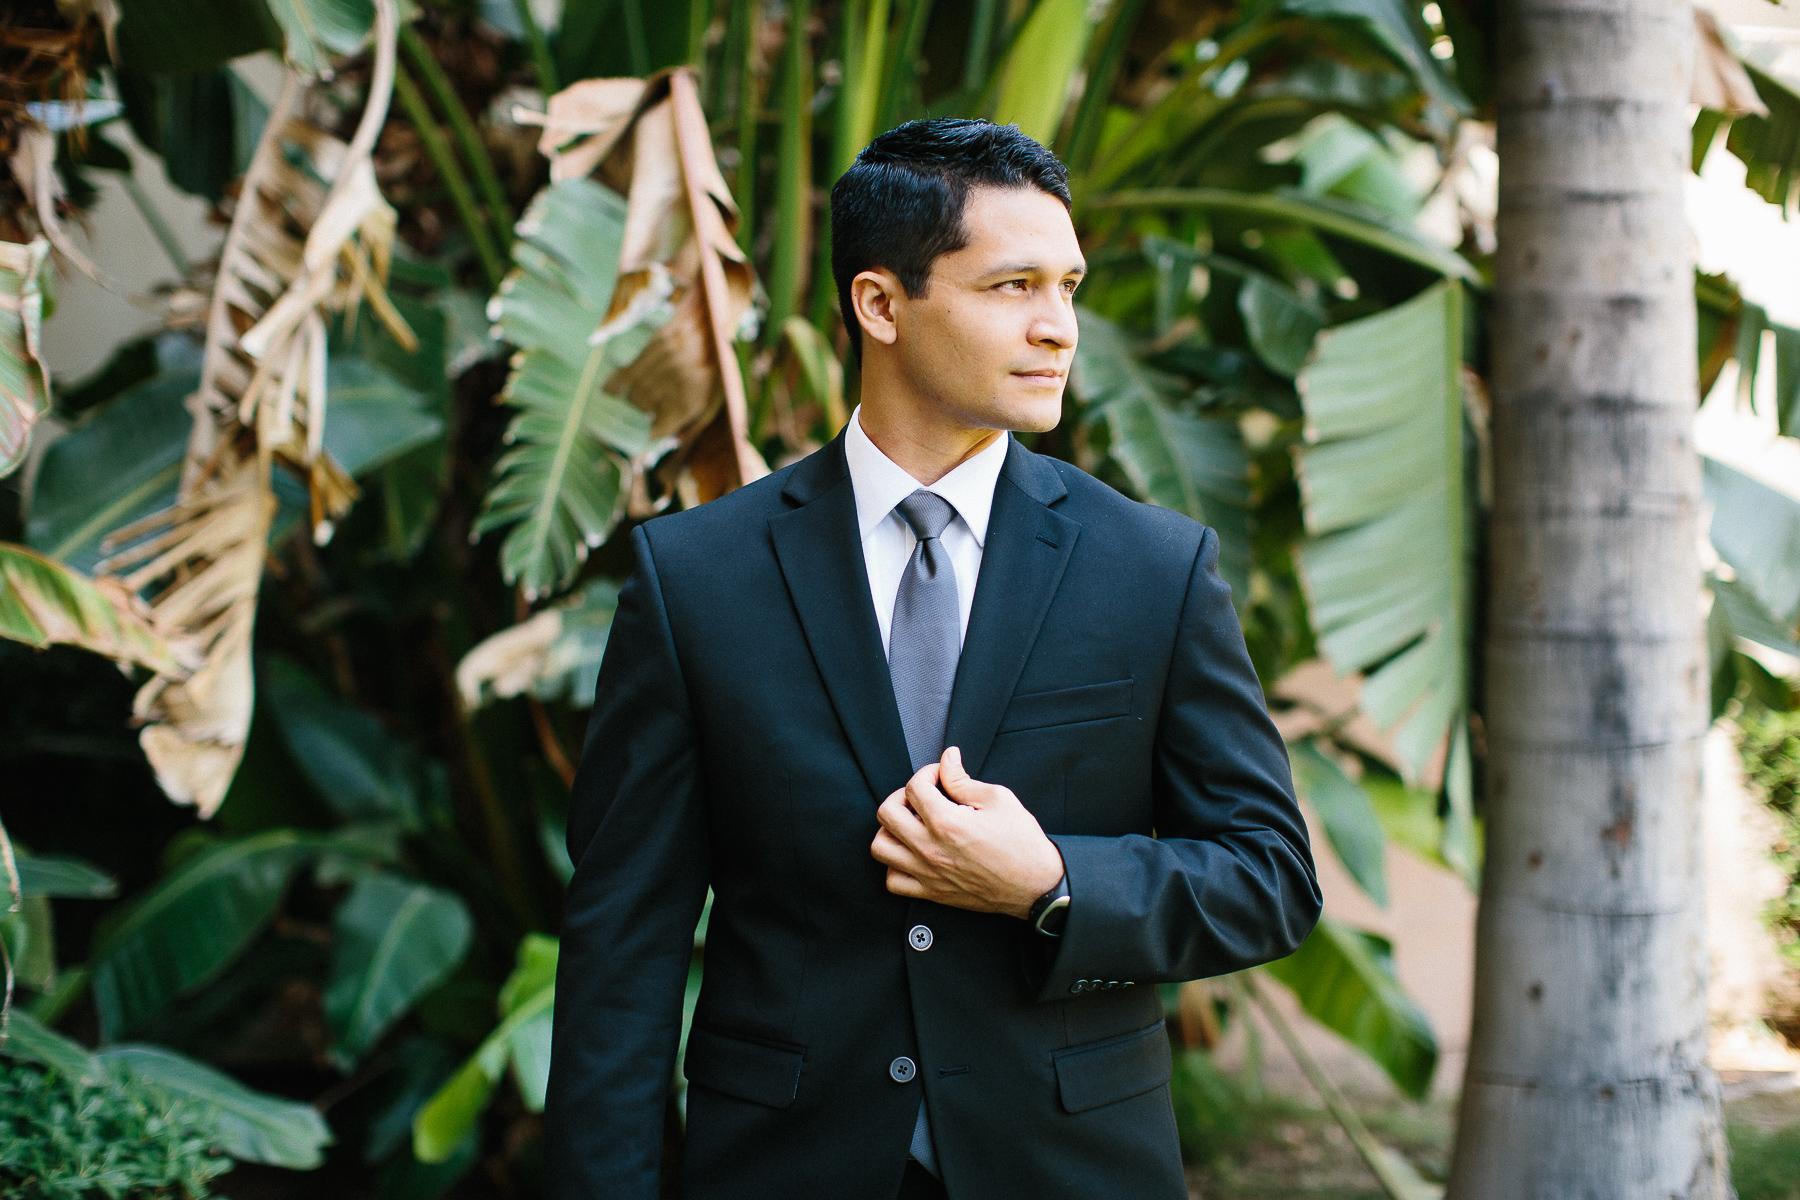 170708-Luxium-Weddings-Arizona-Sheraton-Phoenix-Arizona-Photographer-Hilton-Hawaiian-1004.jpg